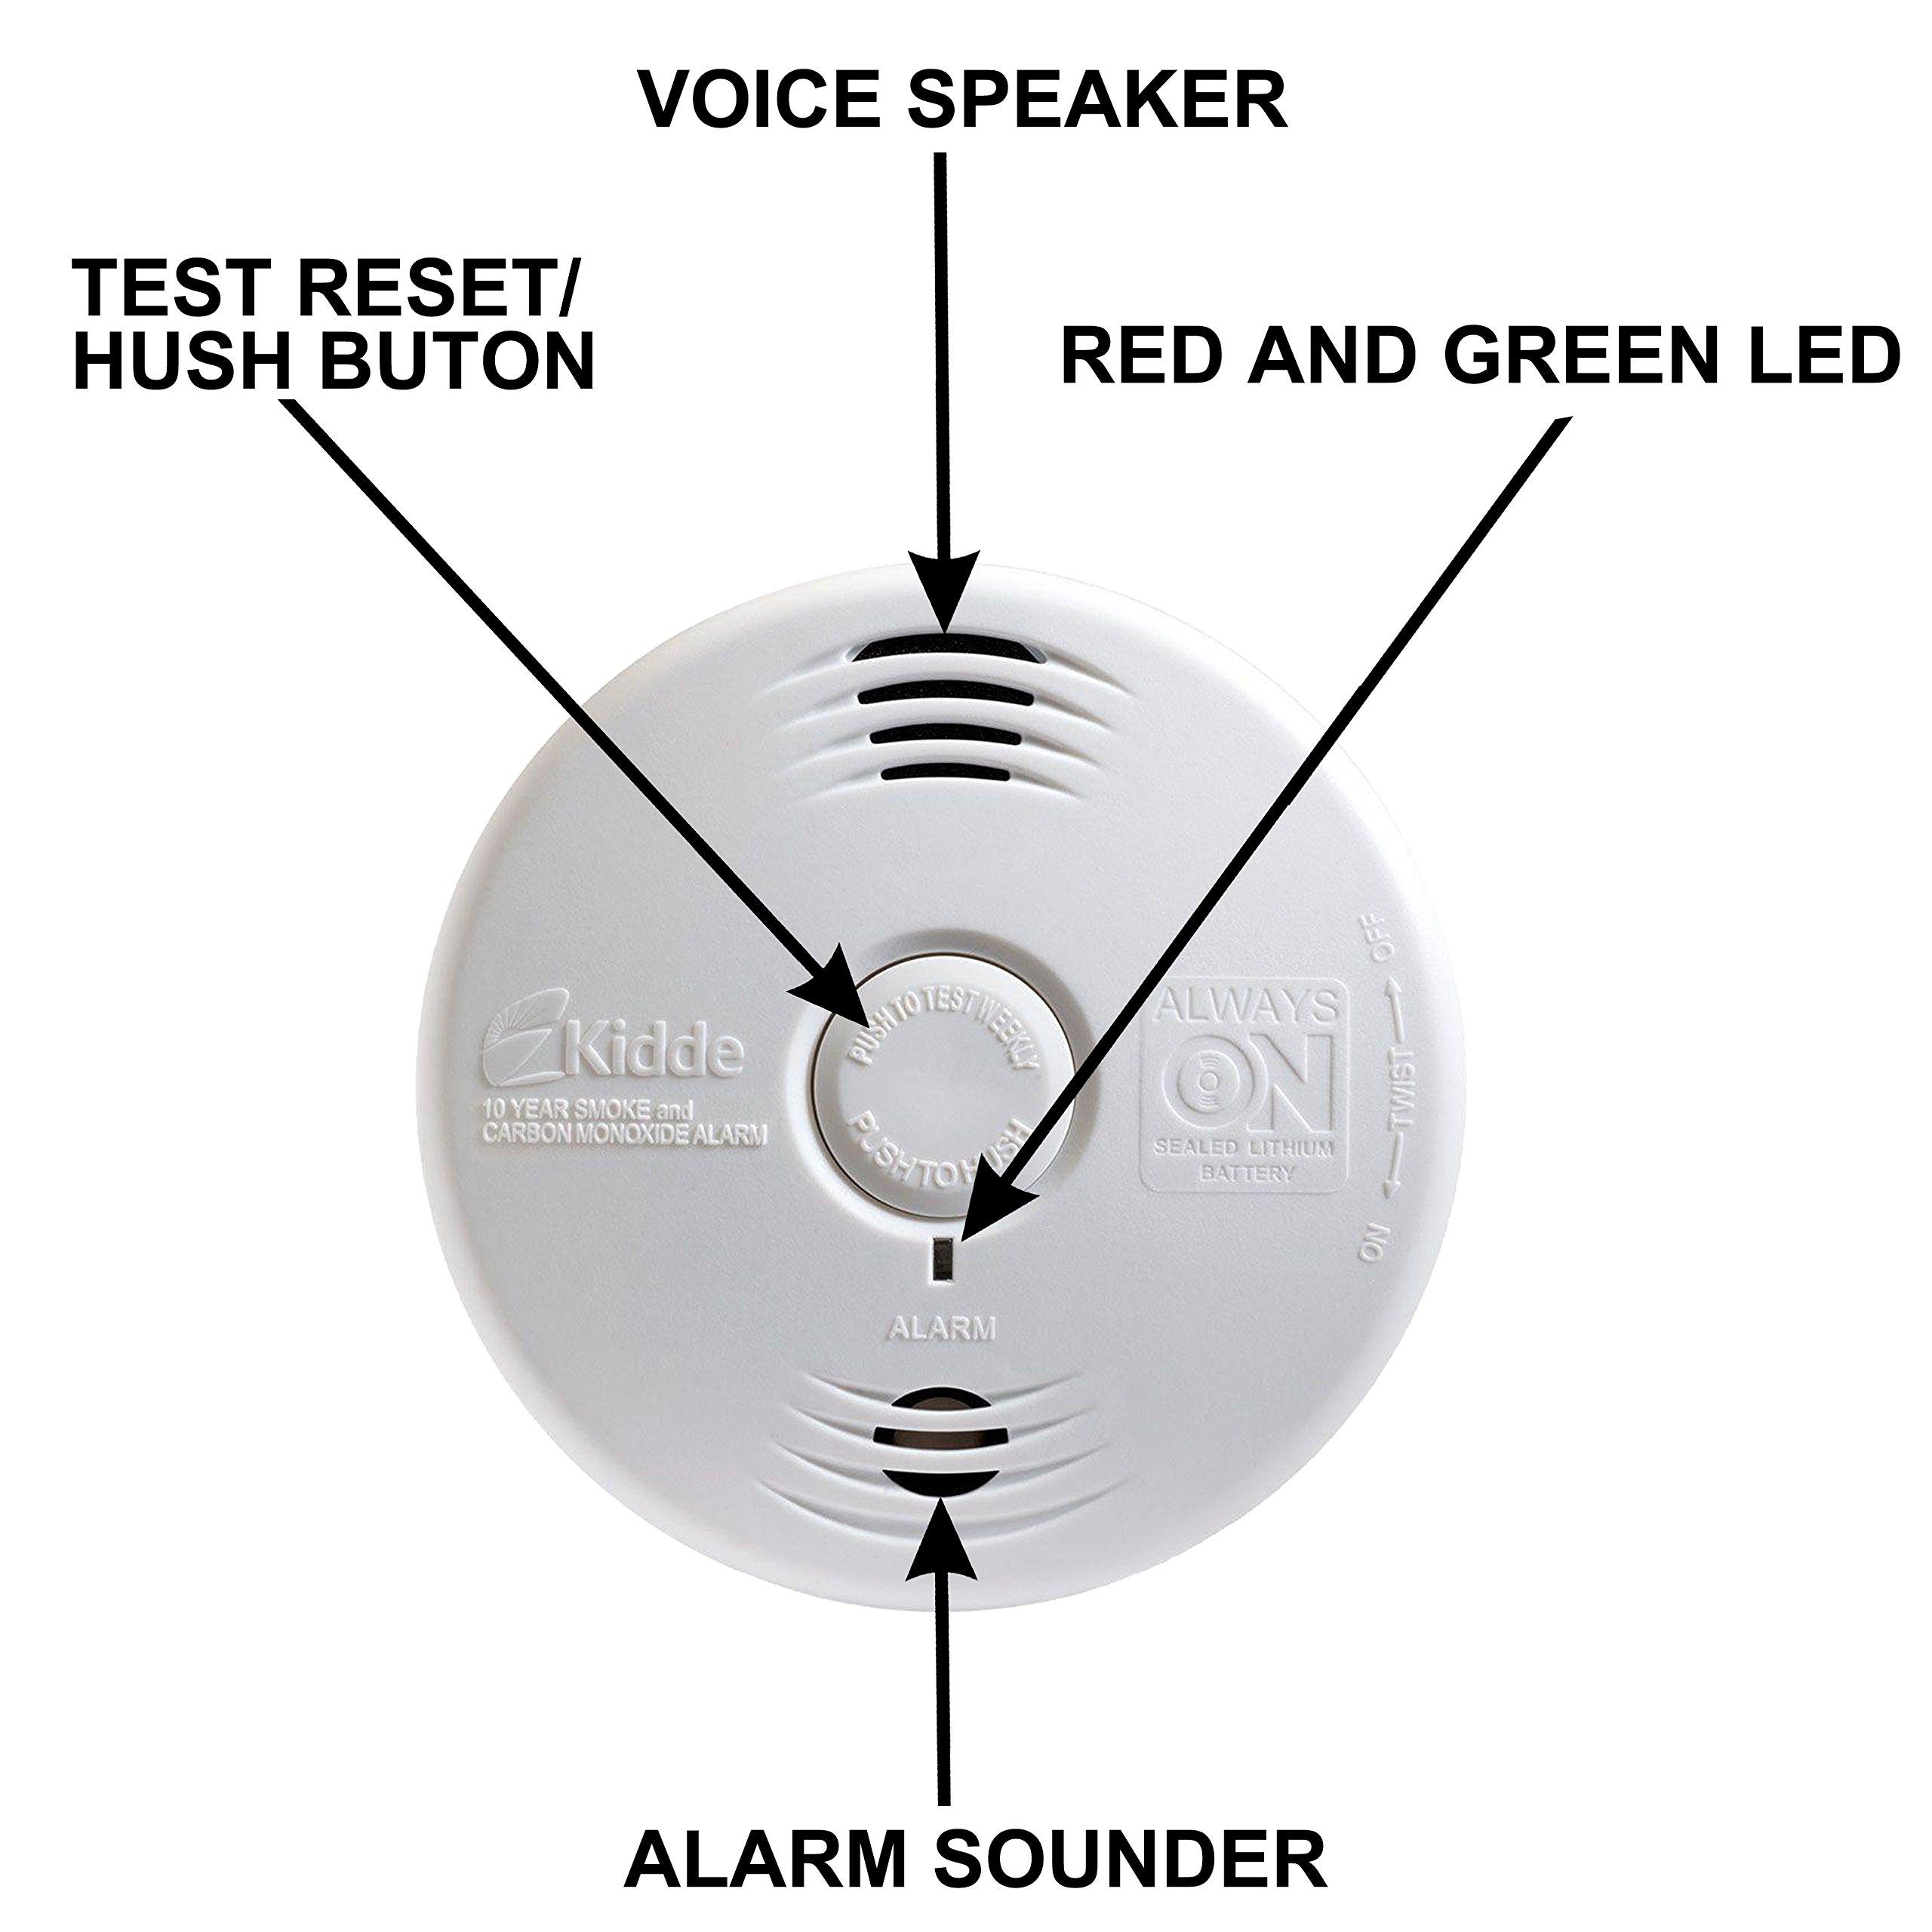 Worry-Free Hardwired Smoke & Carbon Monoxide Alarm with Lithium Battery Backup I12010SCO by Kidde (Image #5)